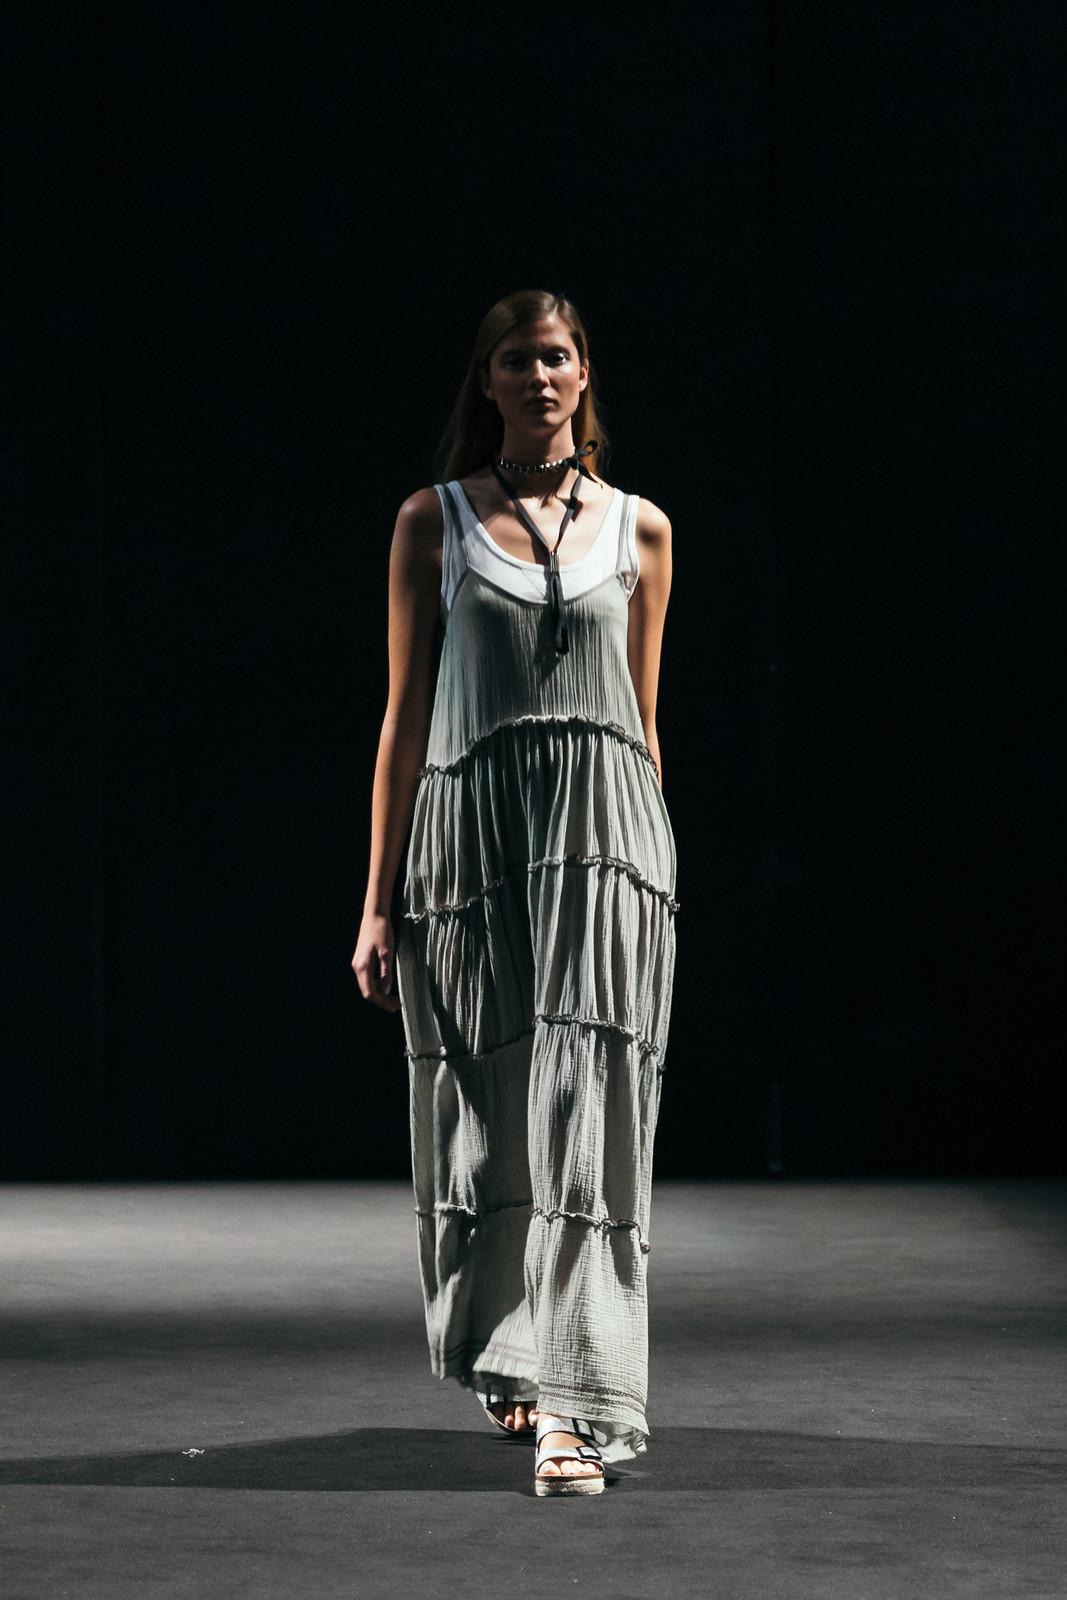 Jessie Chanes - Seams for a desire - 080 Bacelona Fashion #080bcnfasion -36